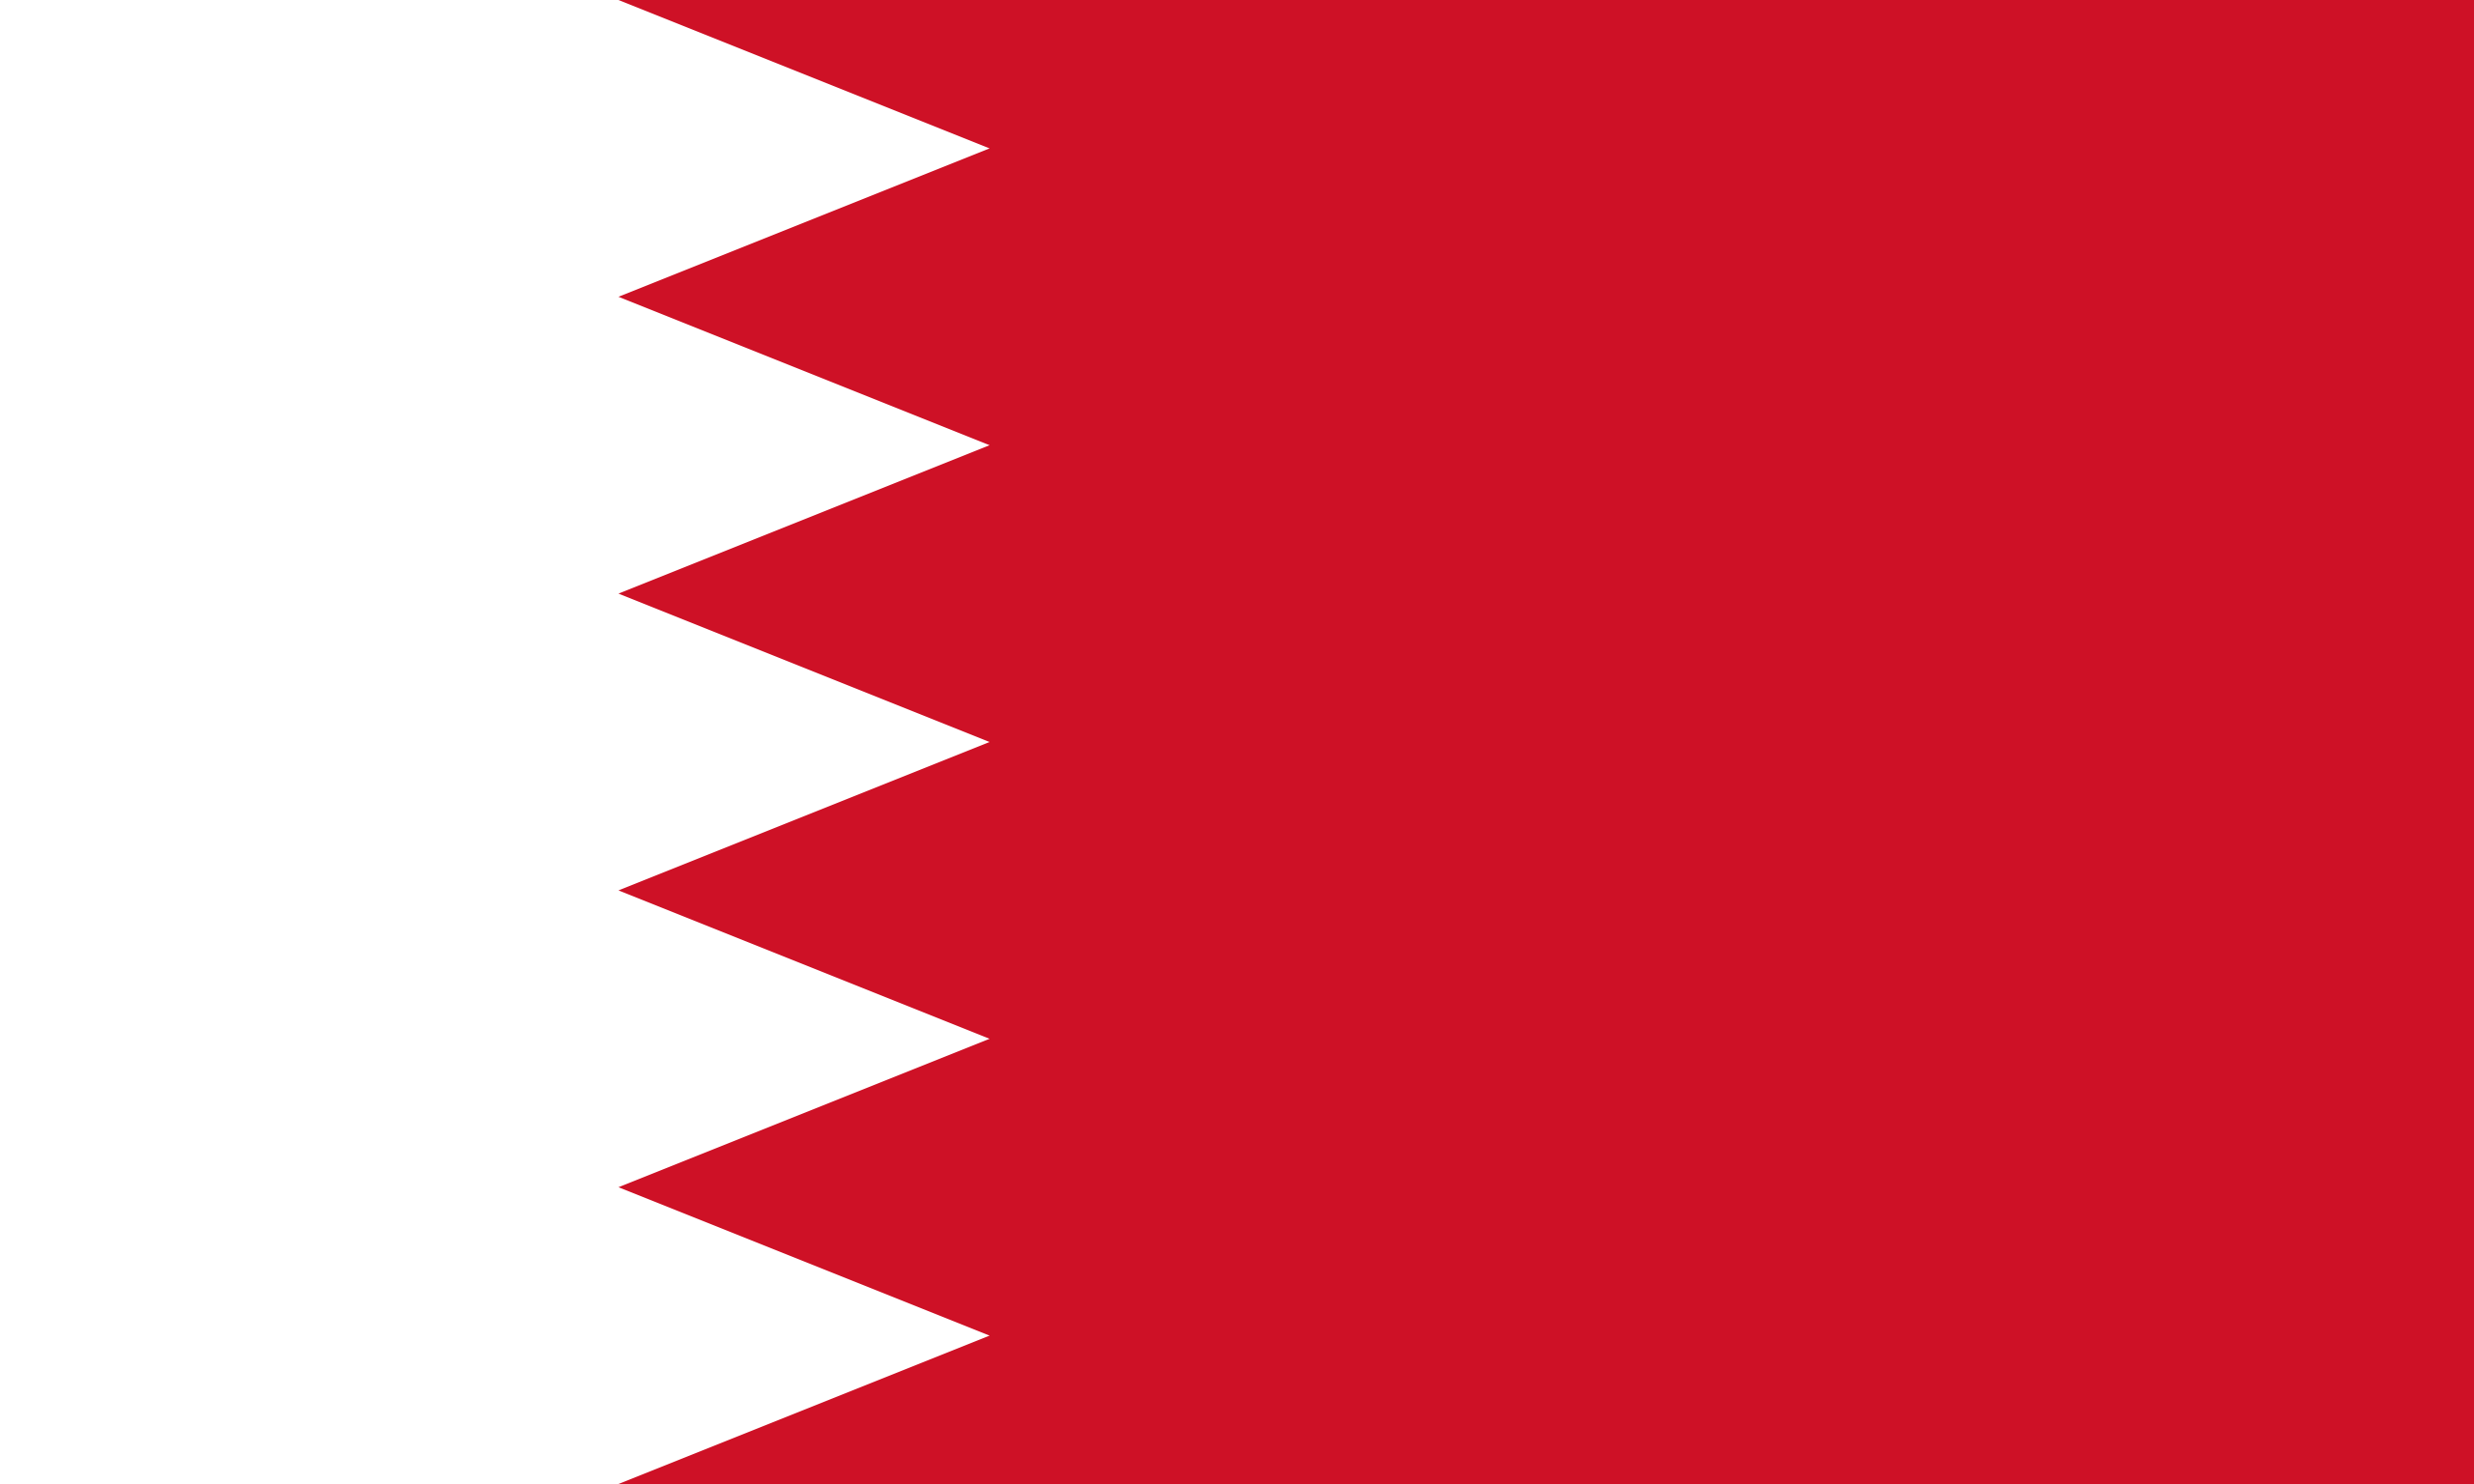 bahréin, 国, エンブレム, ロゴ, シンボル - HD の壁紙 - 教授-falken.com